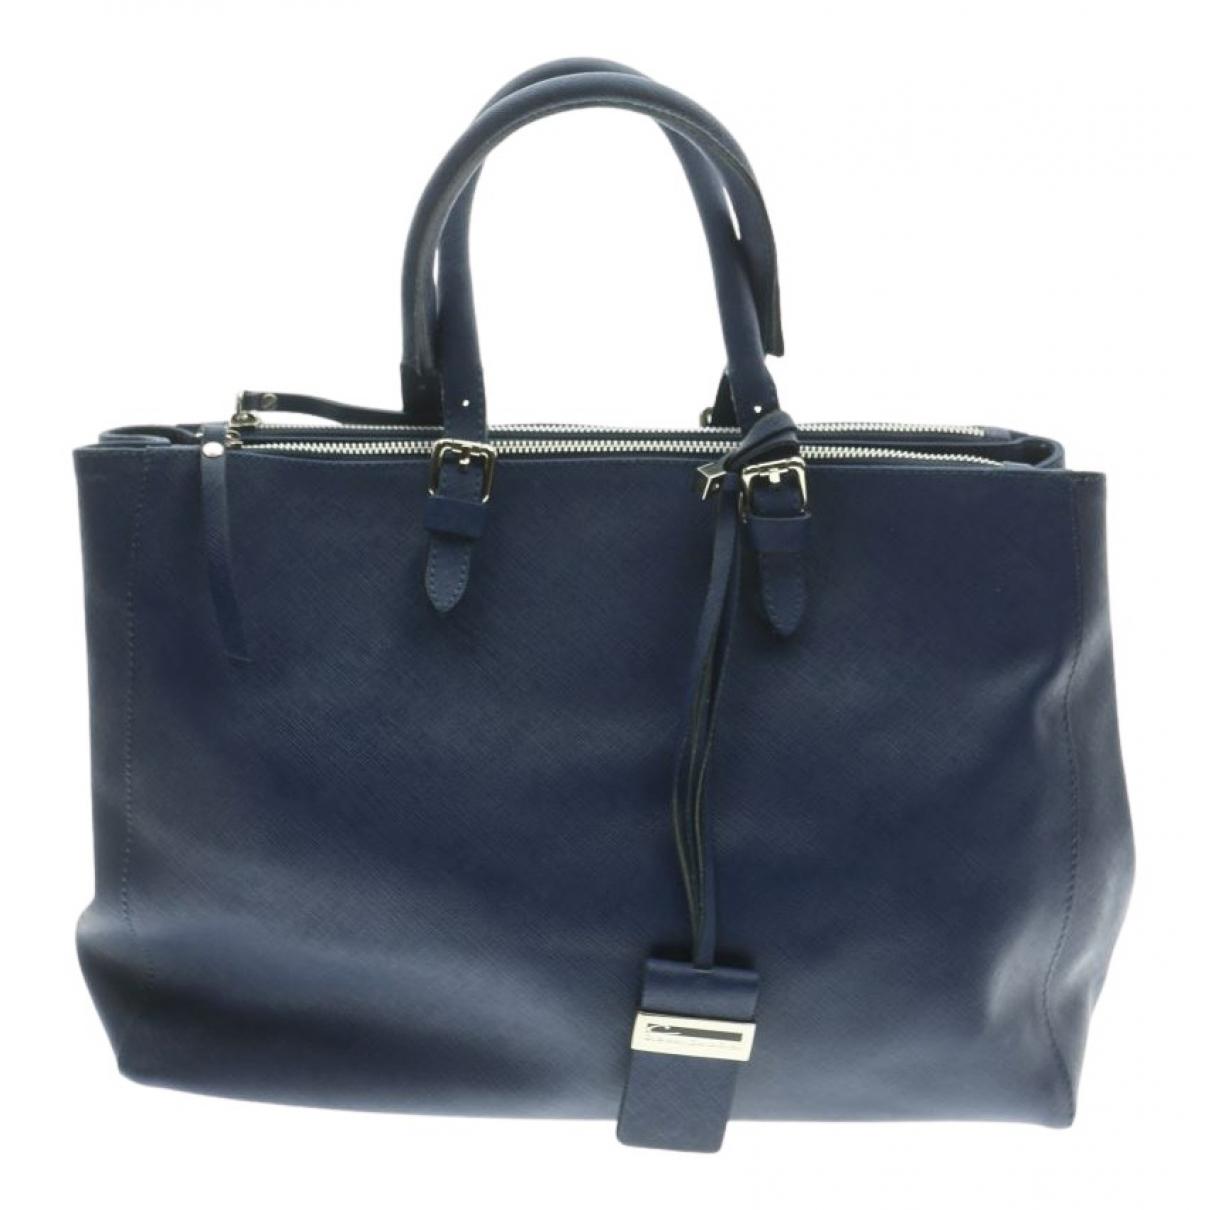 Gianni Chiarini N Blue Fur handbag for Women N